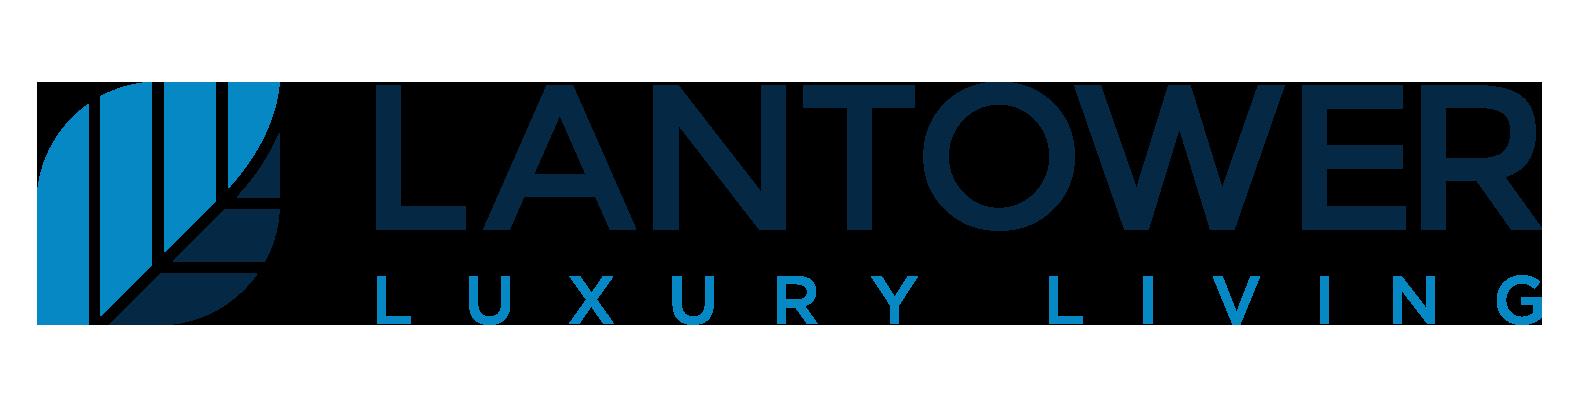 Lantower Luxury Living